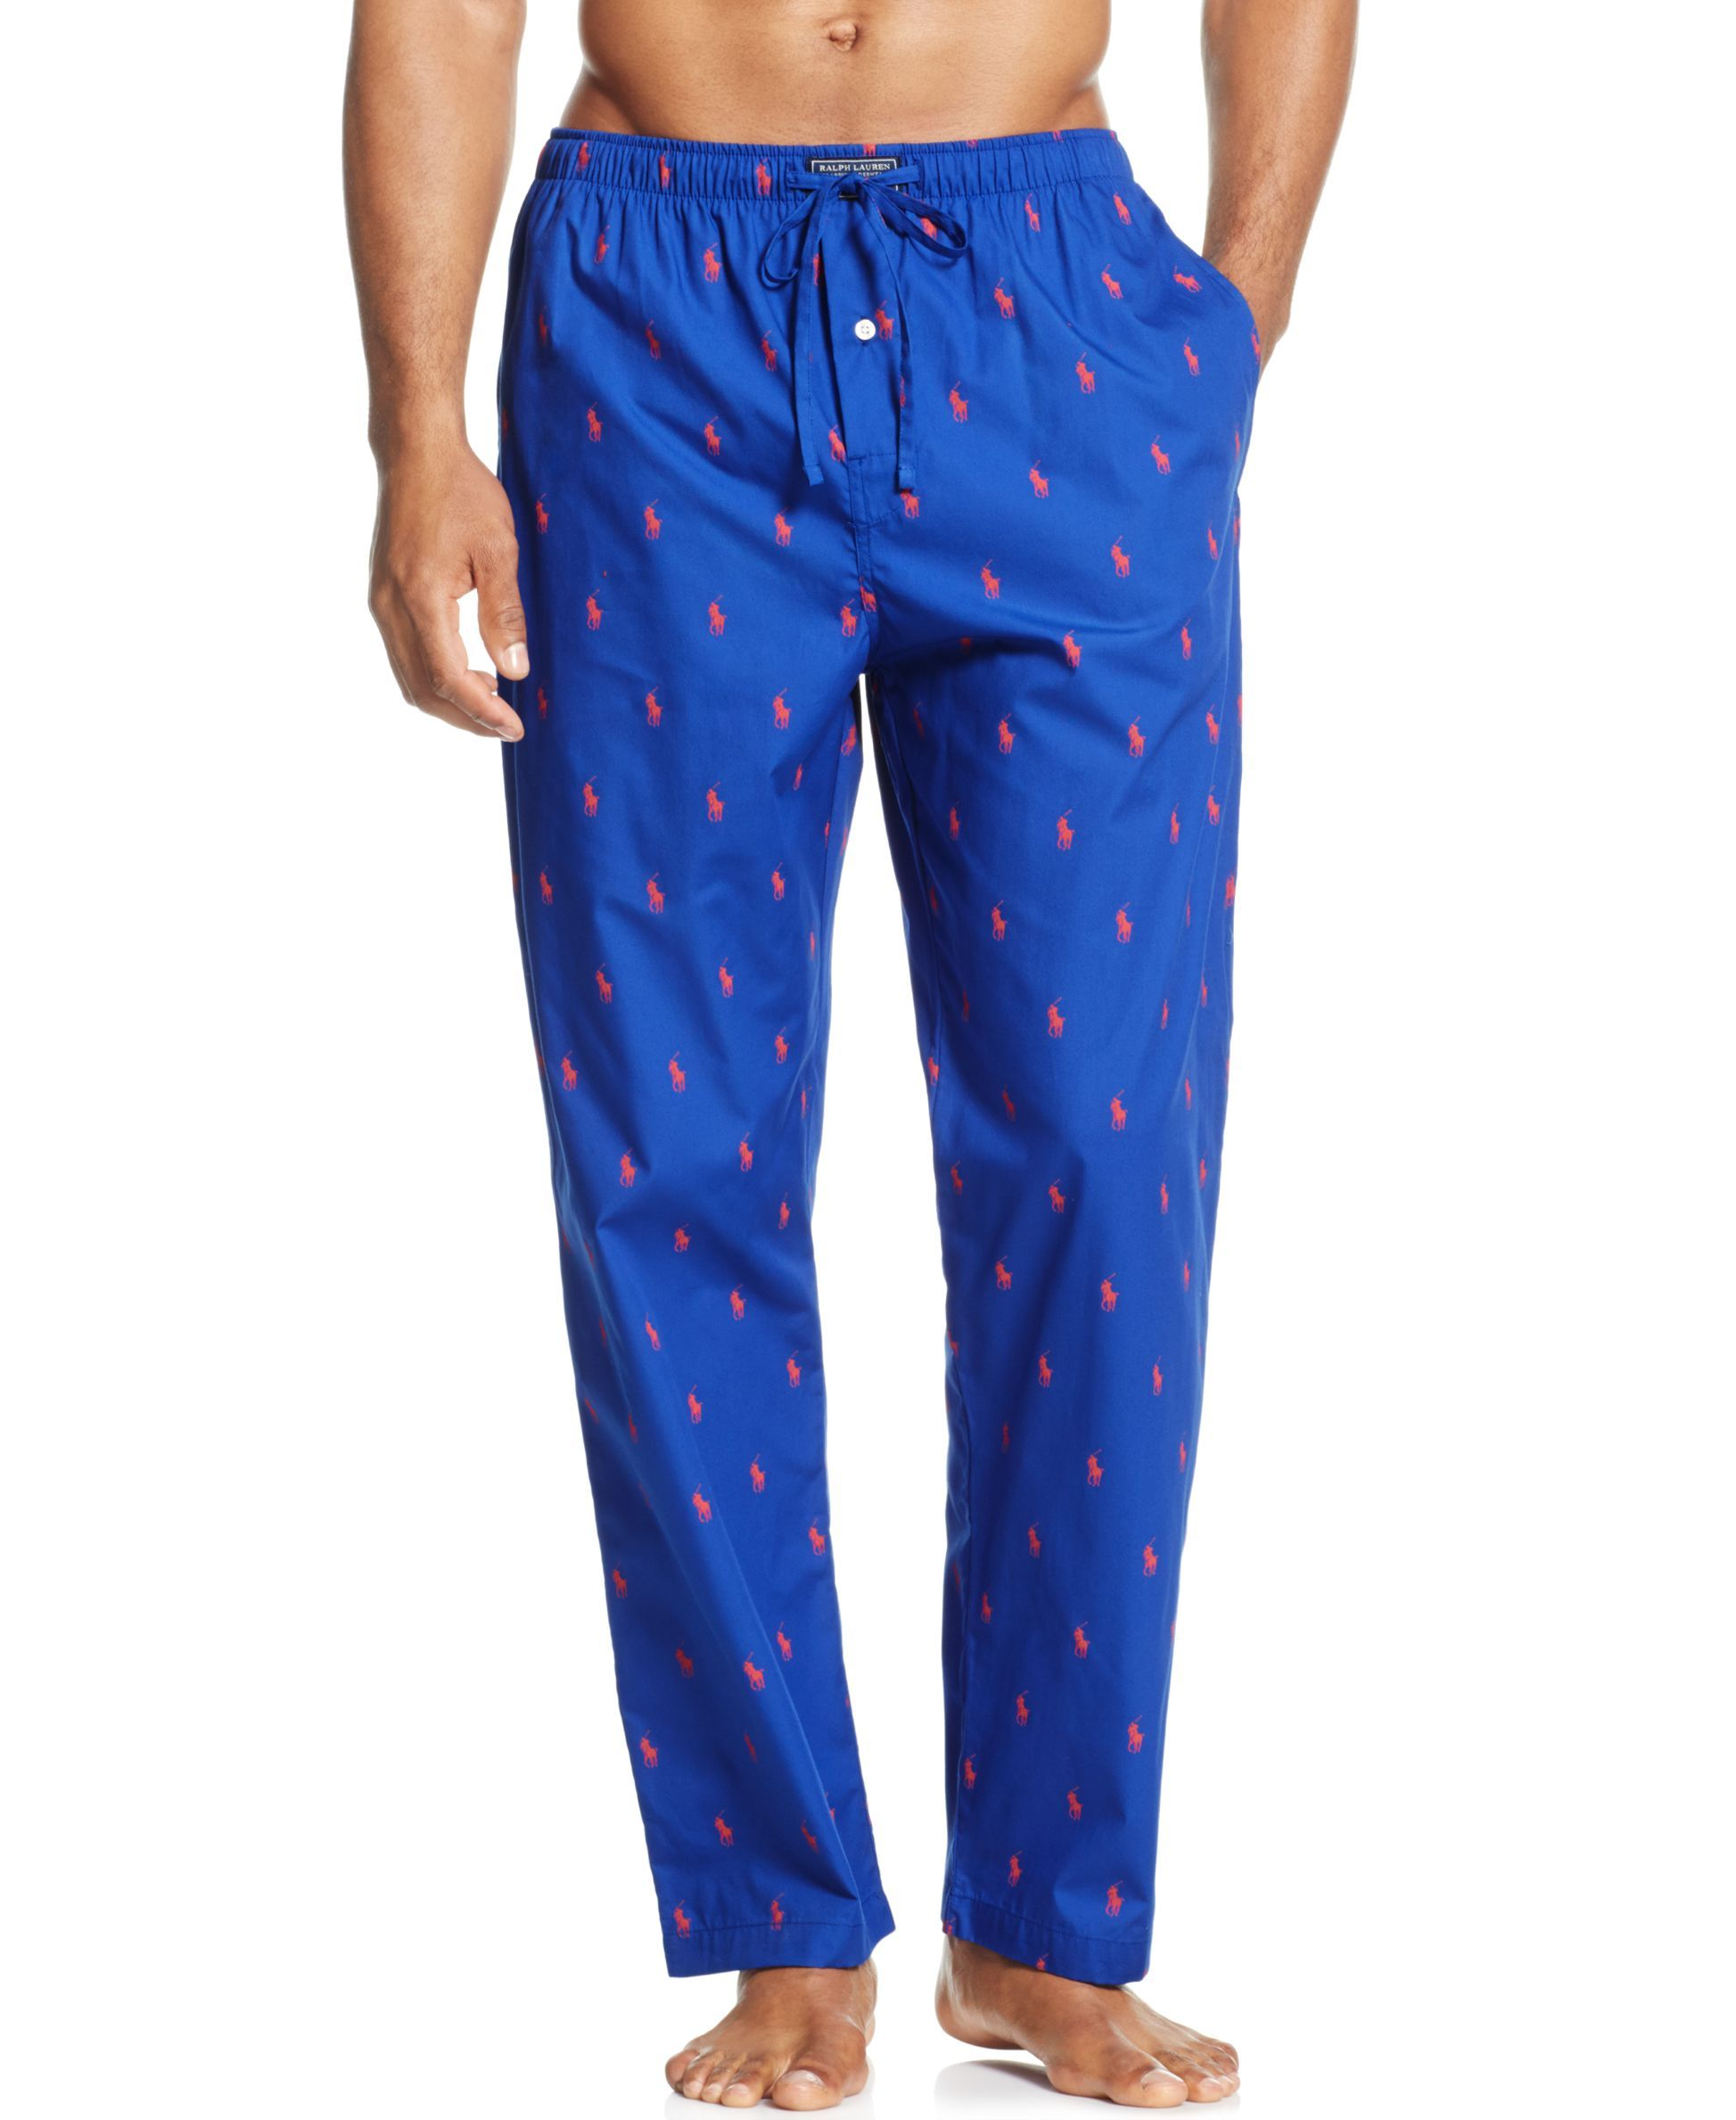 1fea1c056e Polo Ralph Lauren Drawstring Pony-Print Pajama Pants | Products ...